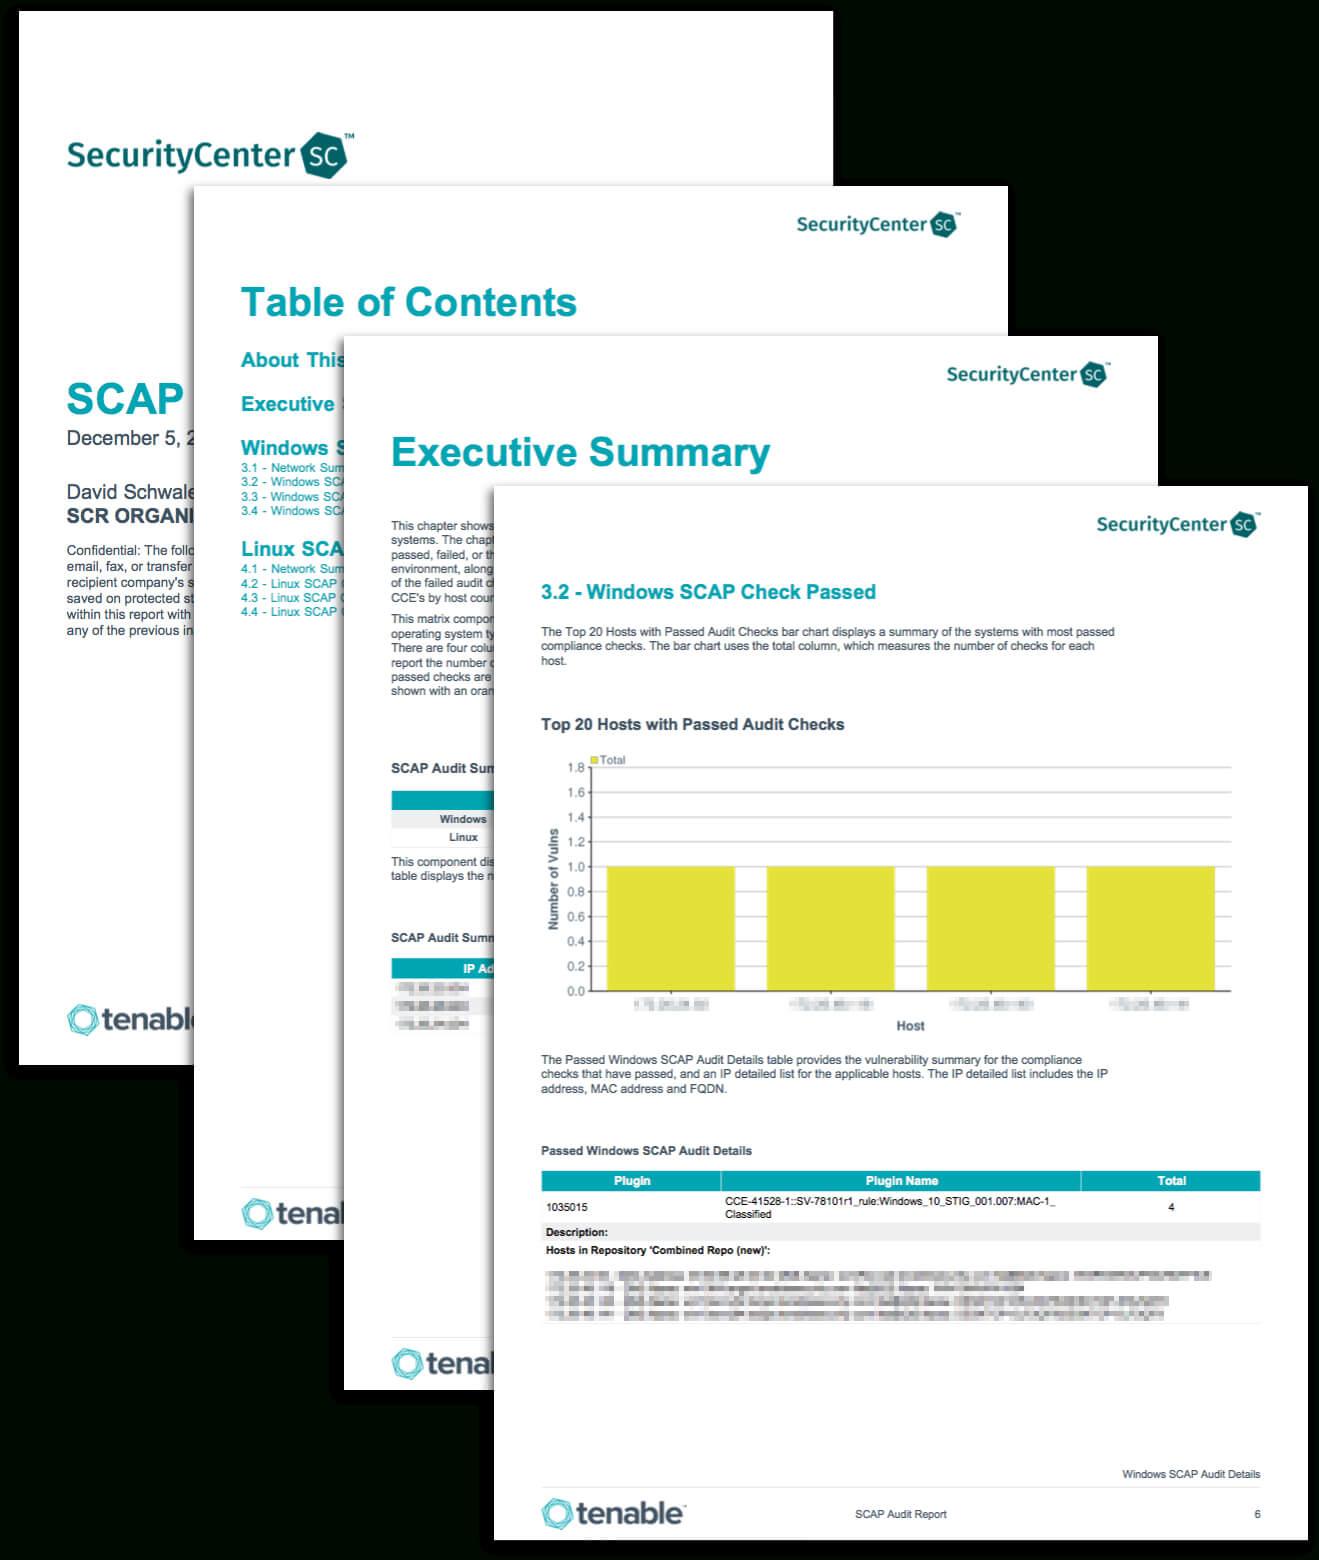 Scap Audit Report - Sc Report Template | Tenable® Inside Data Center Audit Report Template